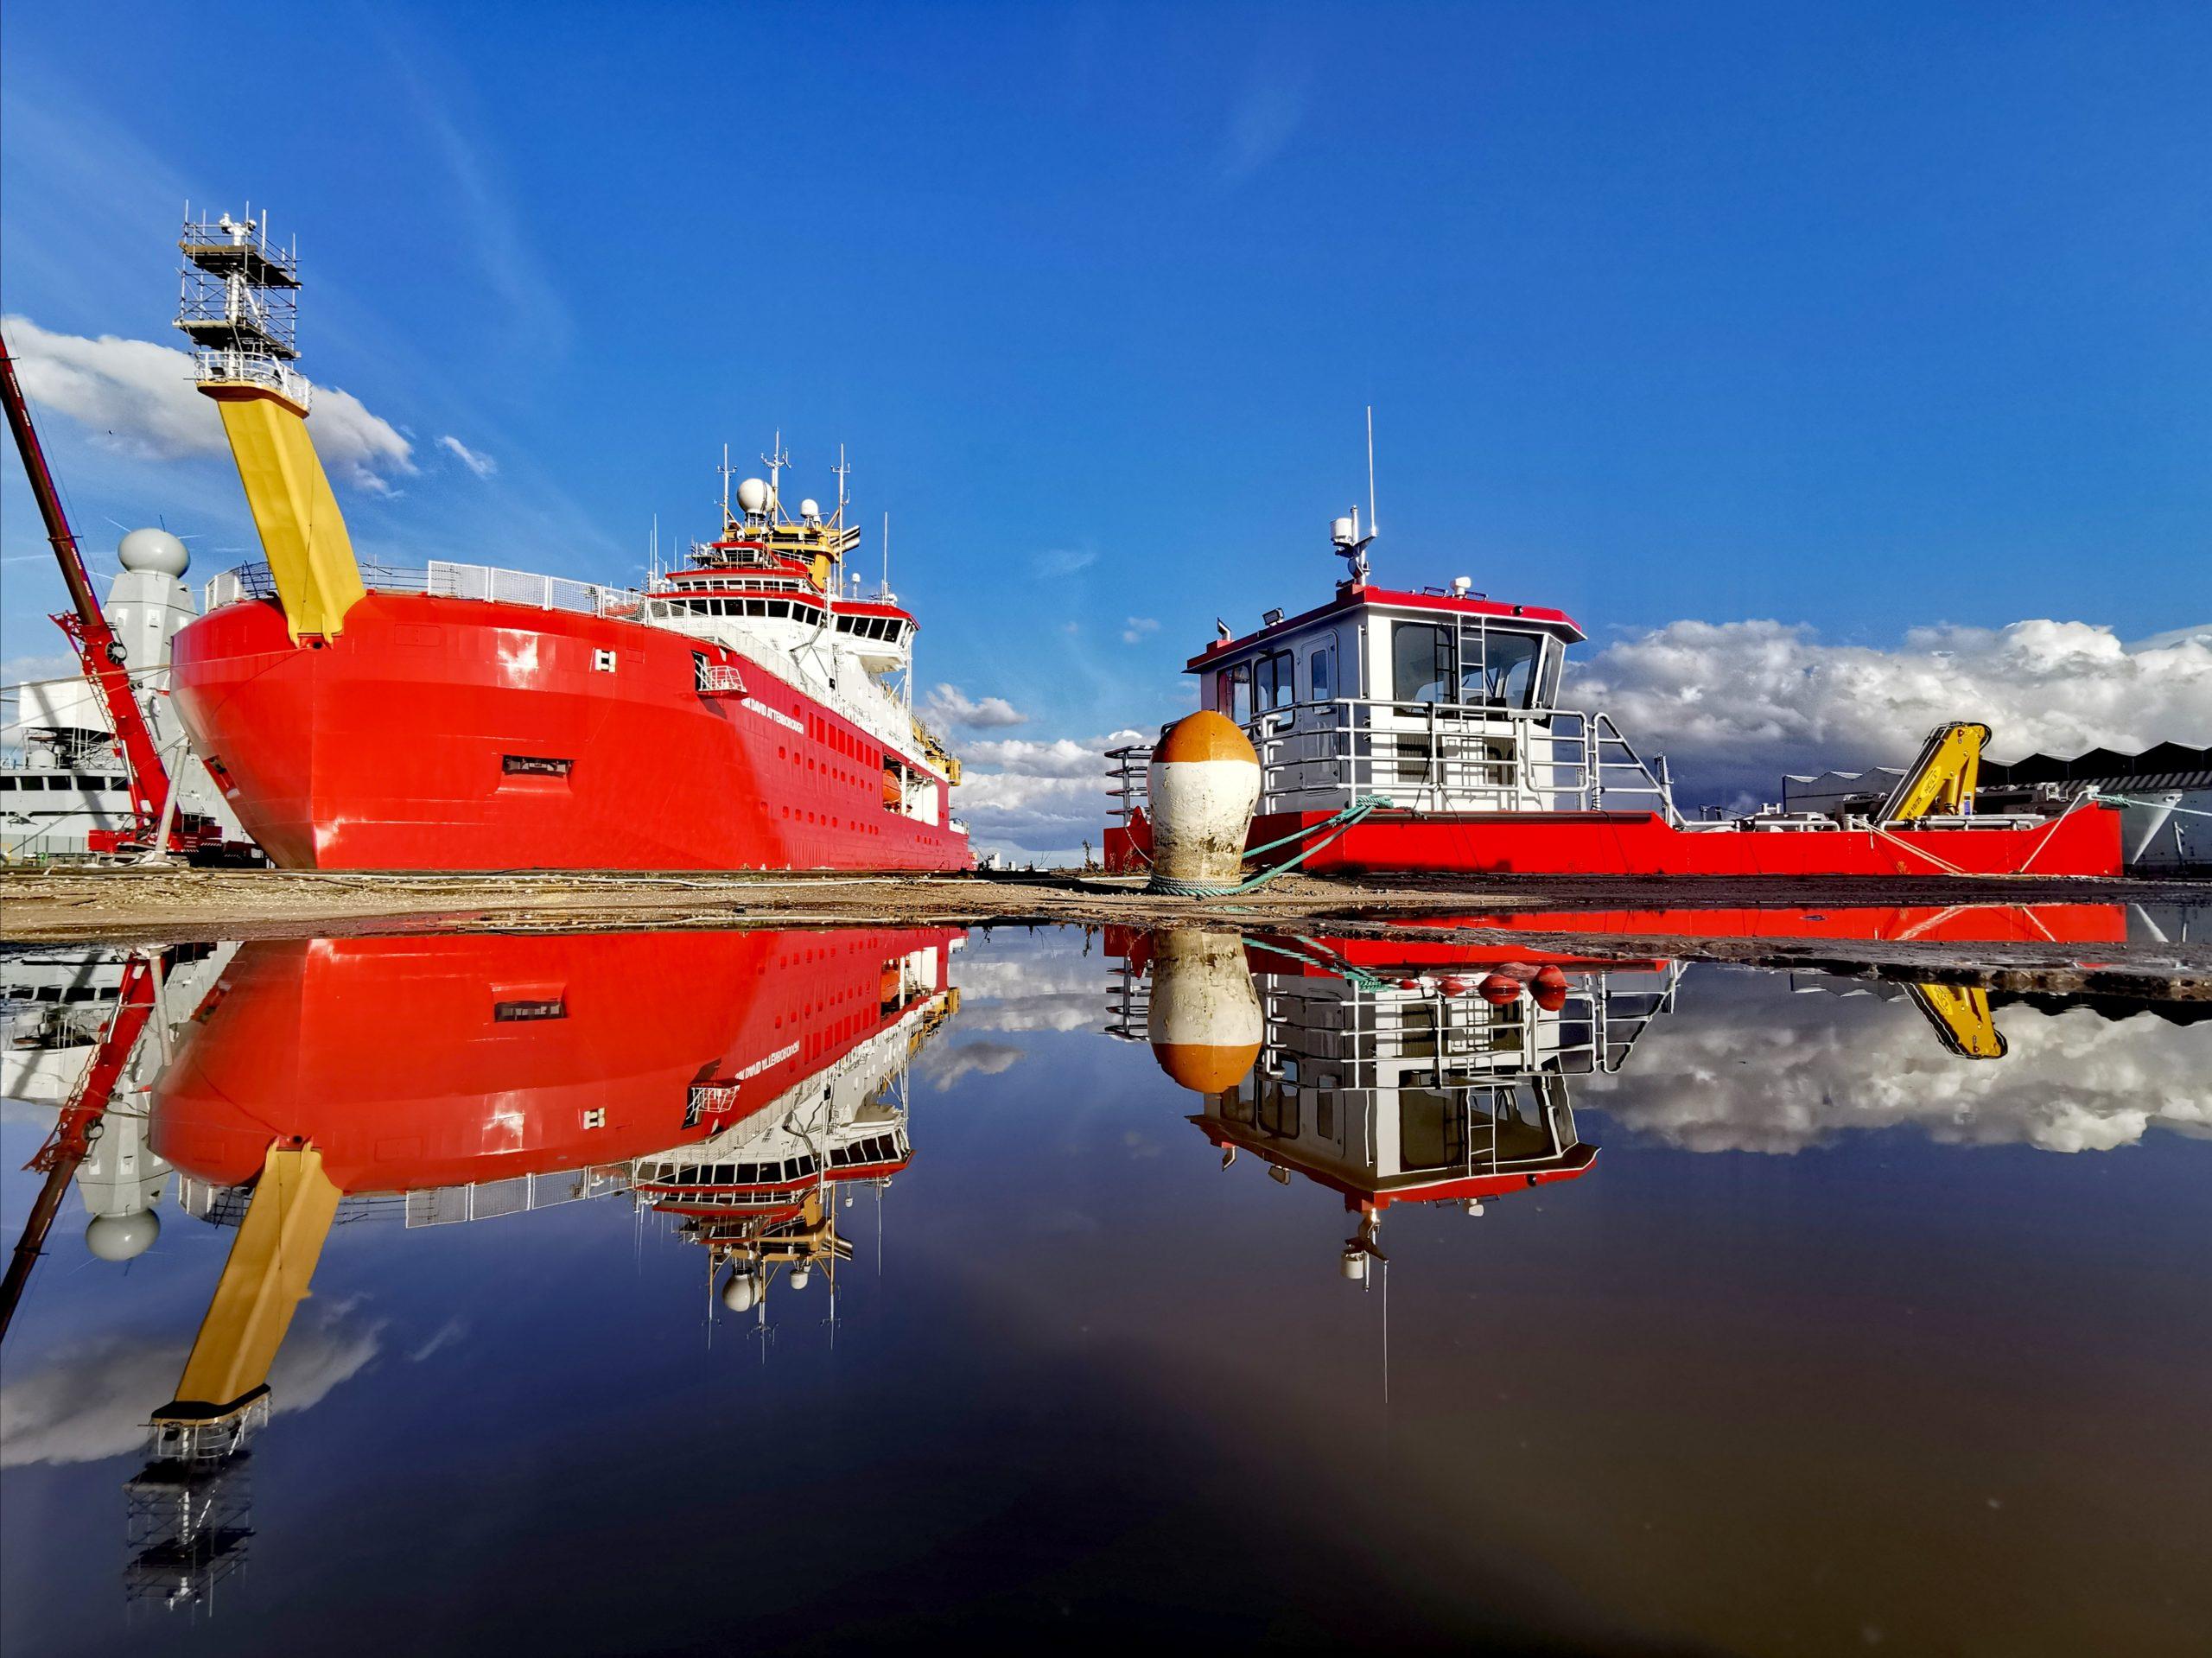 RRS Sir David Attenborough and her cargo tender Terror